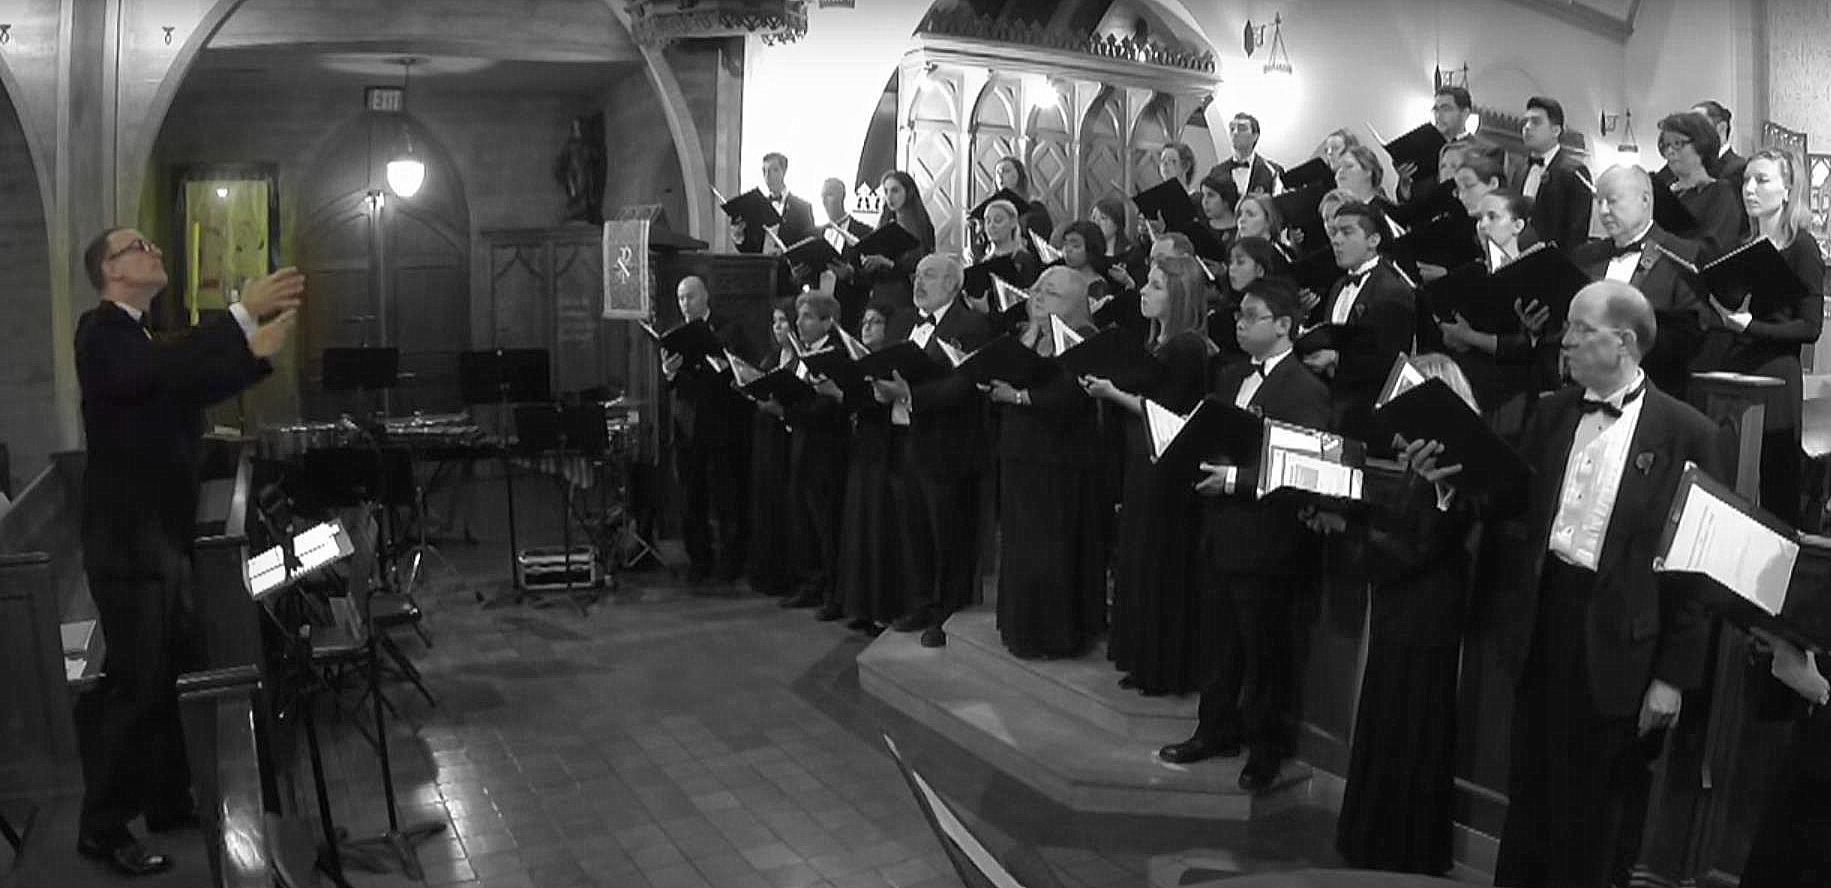 Glendale Community College Concert Singers